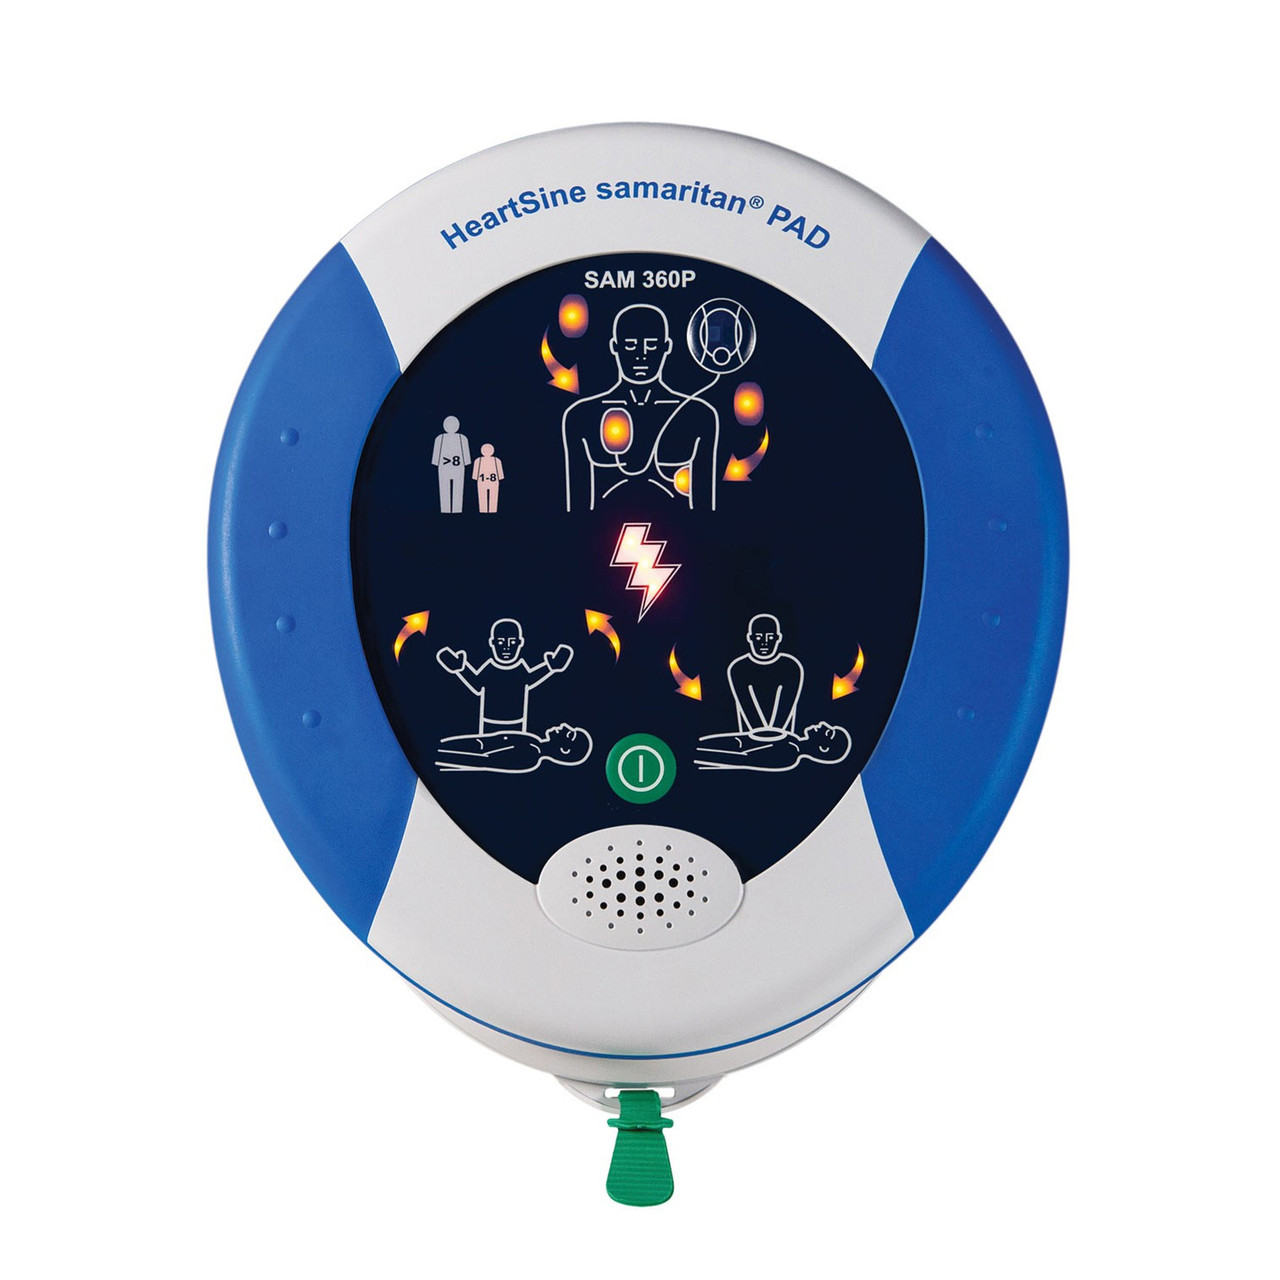 HeartSine® Samaritan® PAD 360P (Fully Auto)